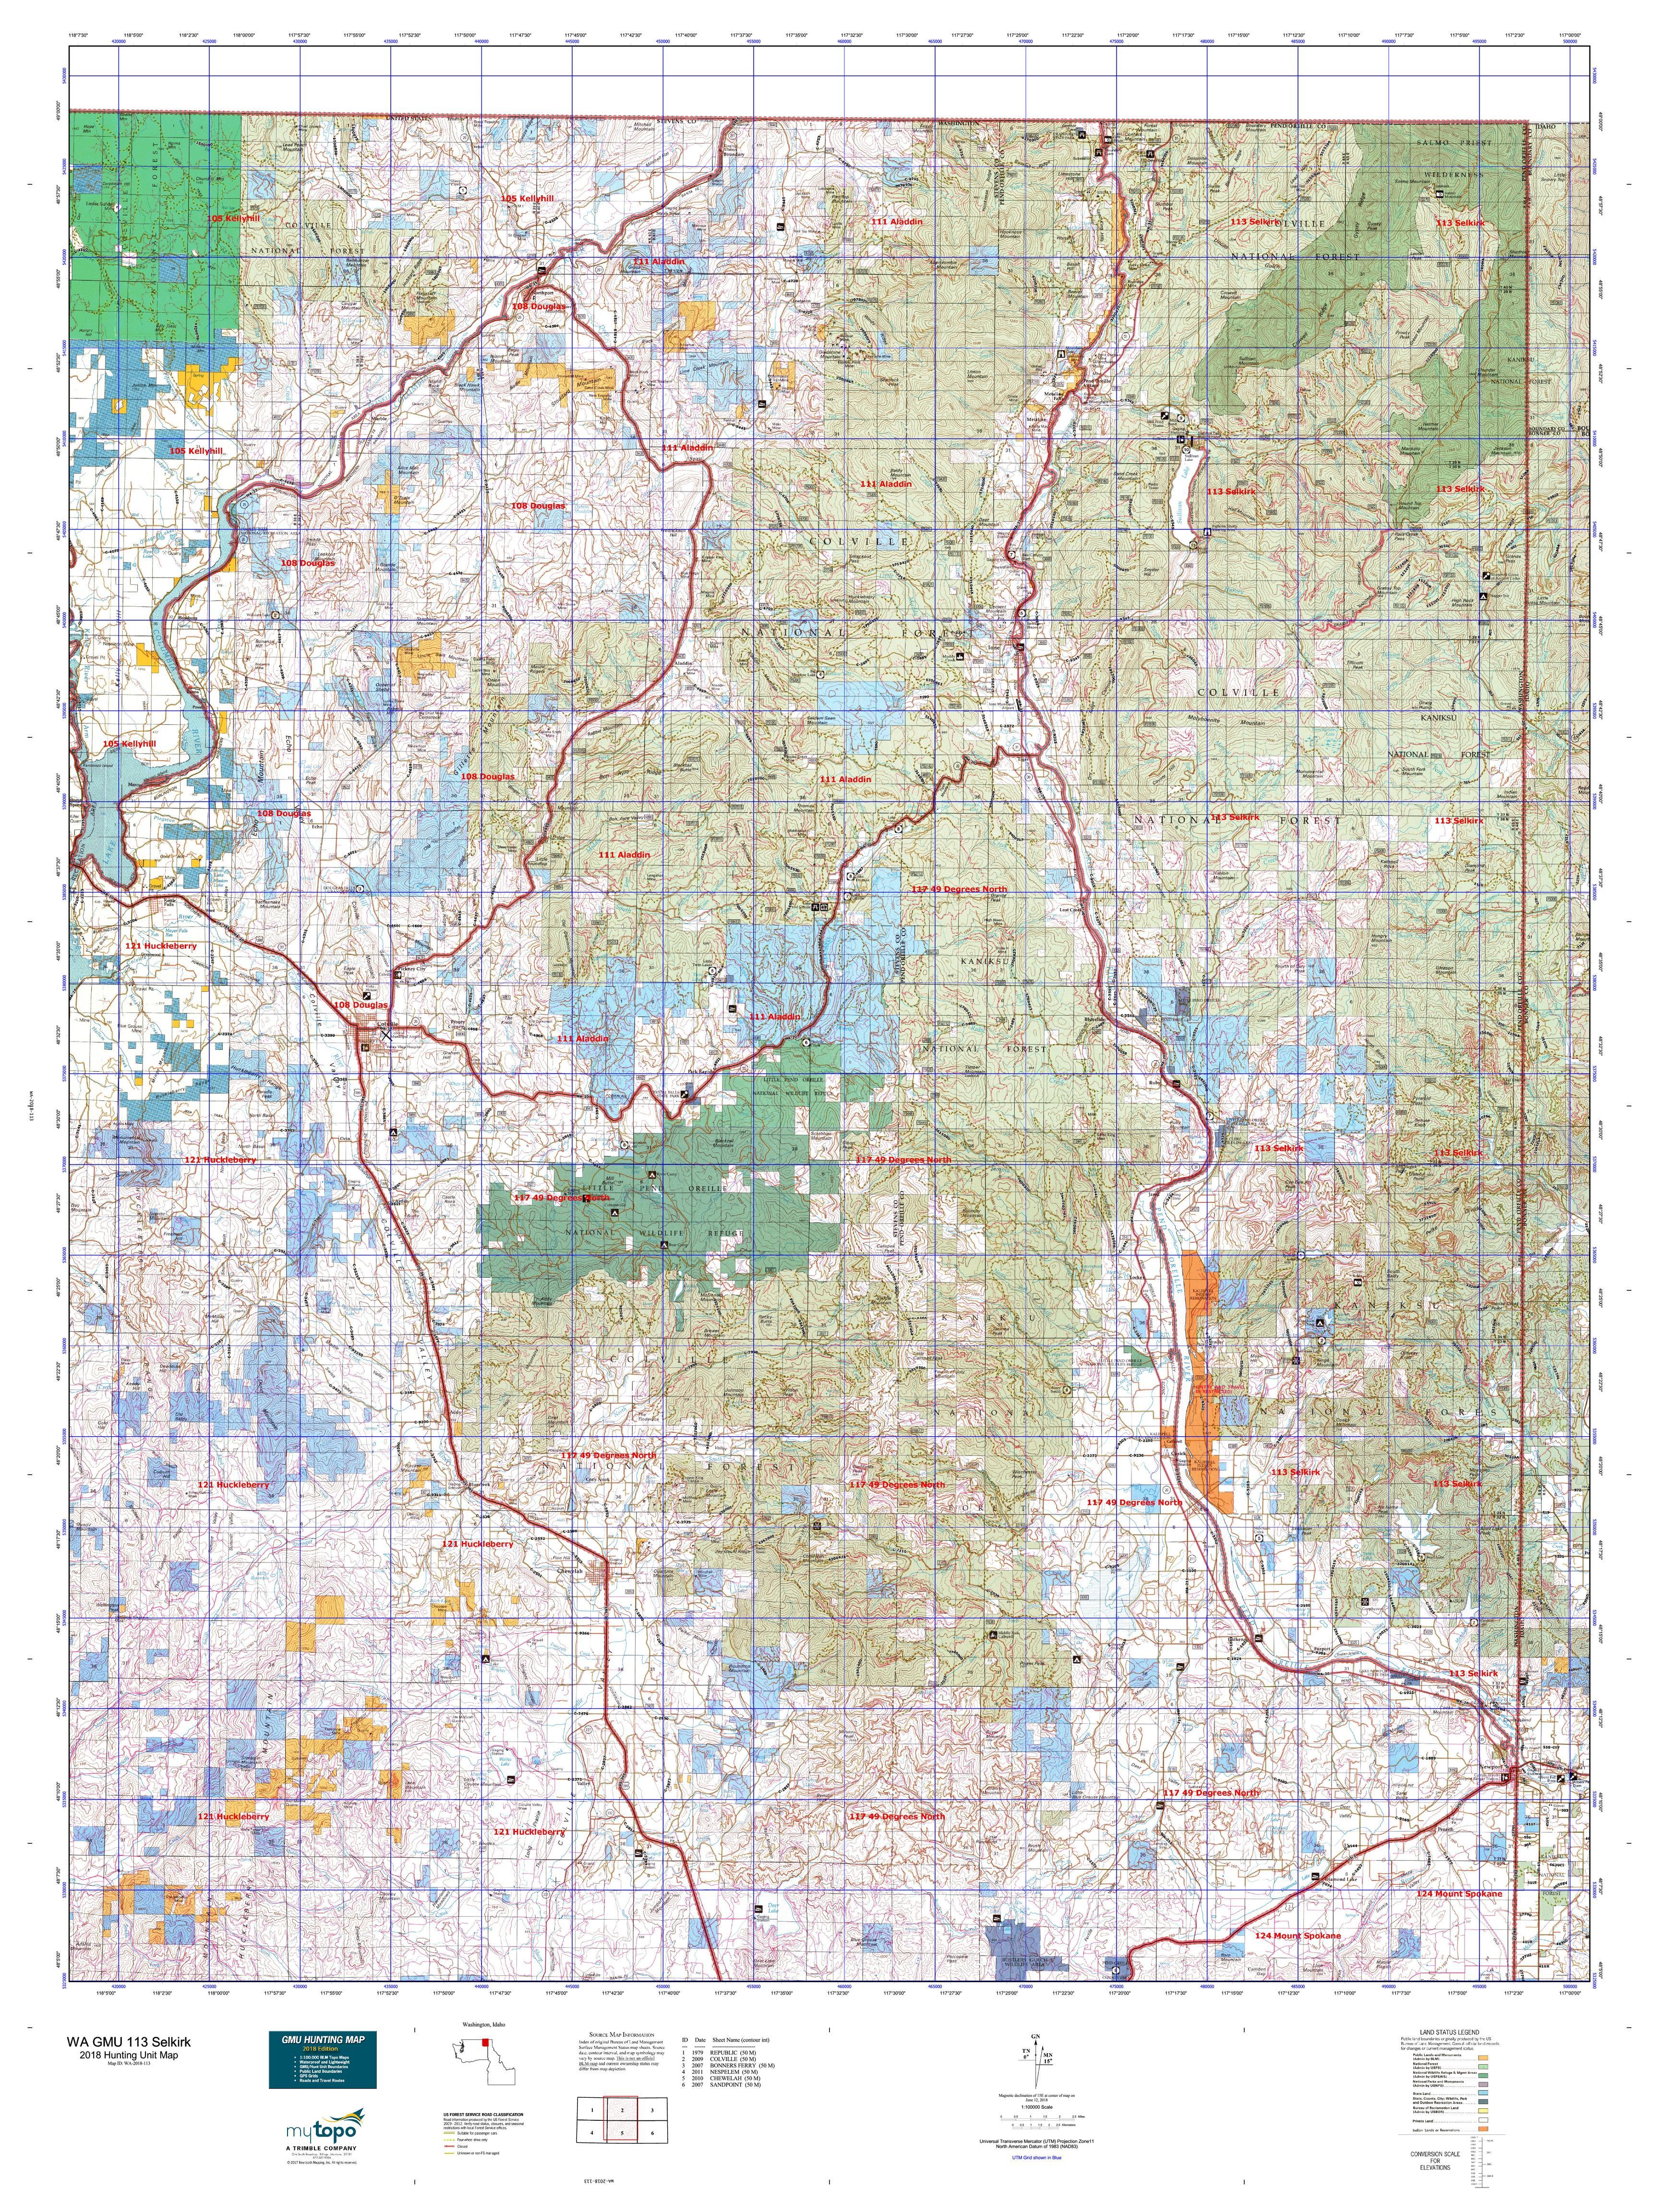 WA GMU 113 Selkirk Map | MyTopo